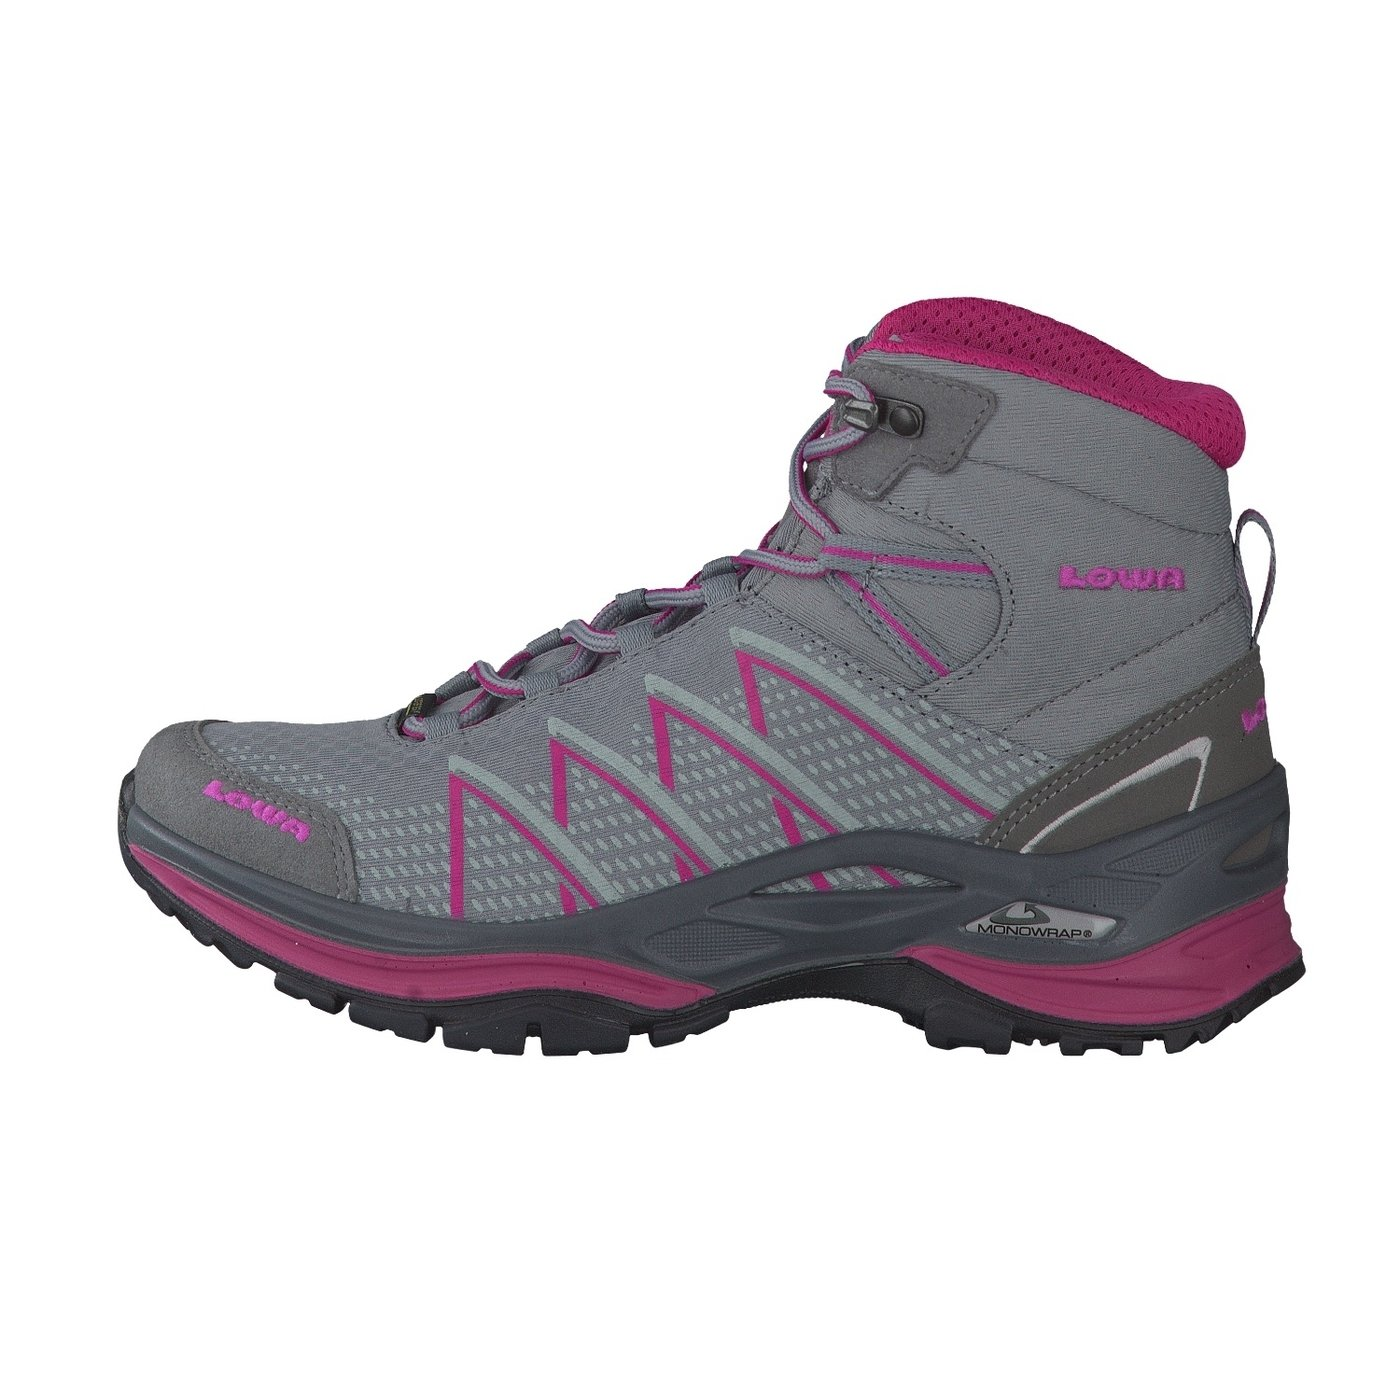 2a50c6df217 Lowa FERROX Evo GTX Mid Ws - Women Trekking shoes: Amazon.co.uk: Shoes &  Bags